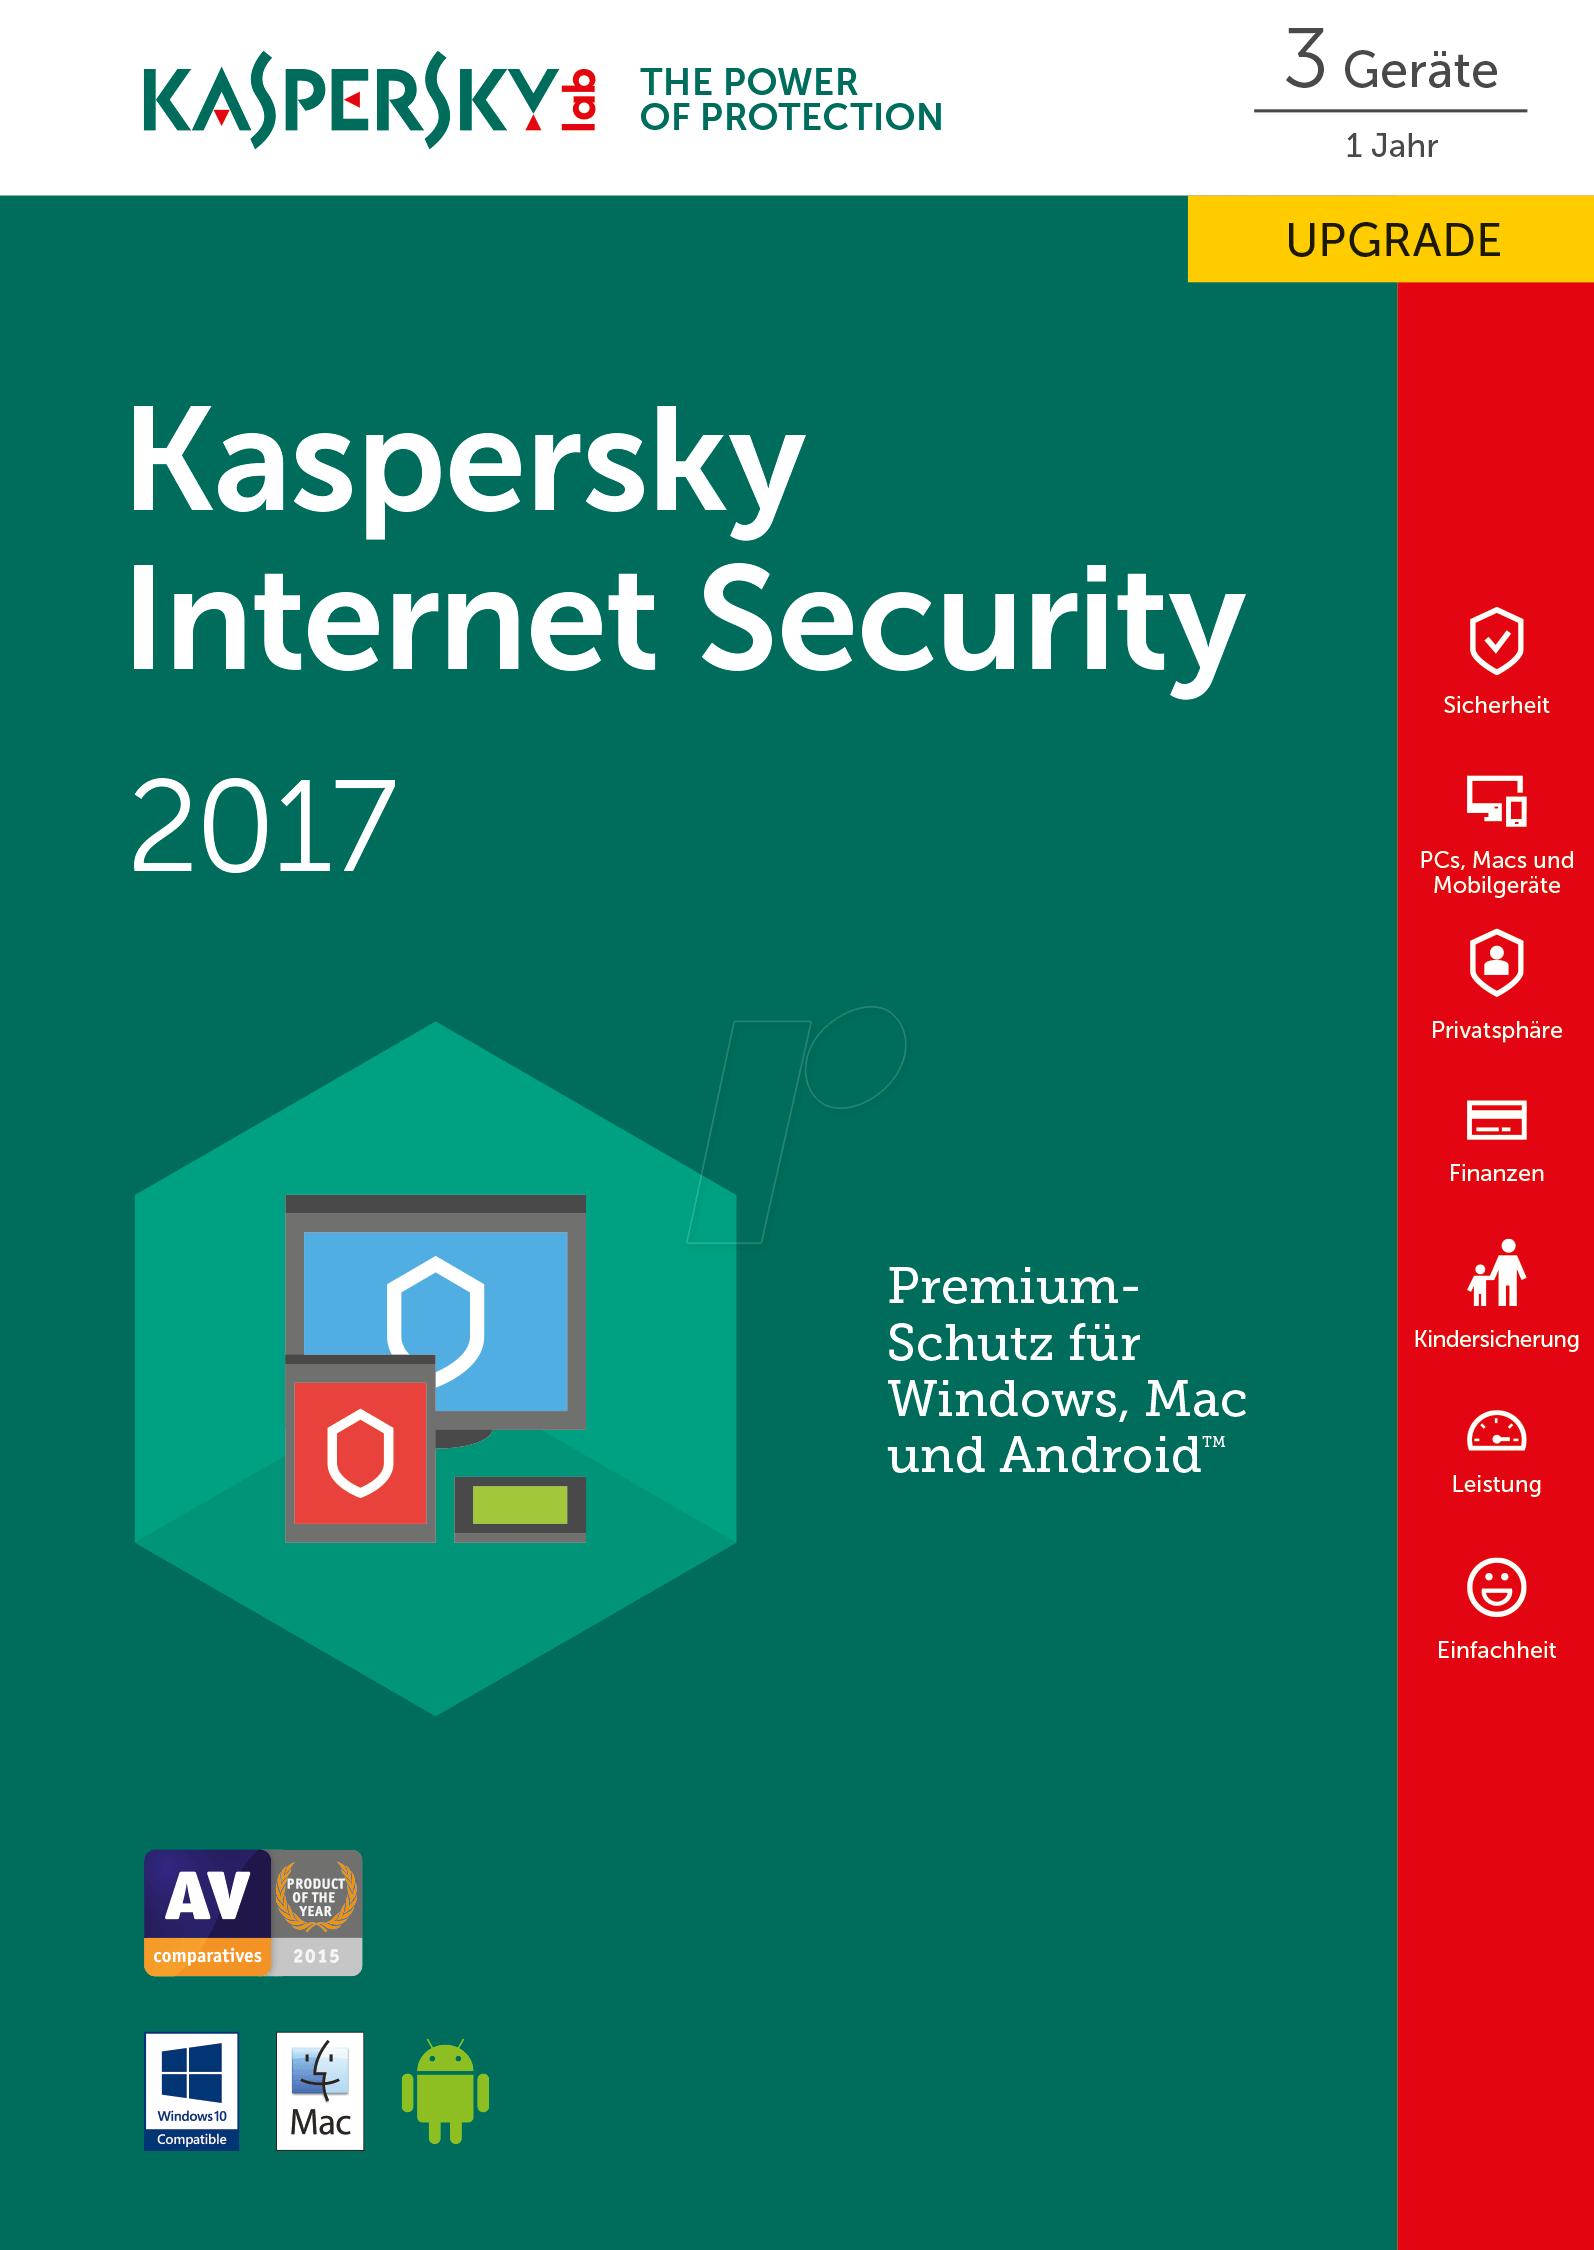 https://cdn-reichelt.de/bilder/web/xxl_ws/G500/KASPERSKY_IS2017_3U_UPG_02.png